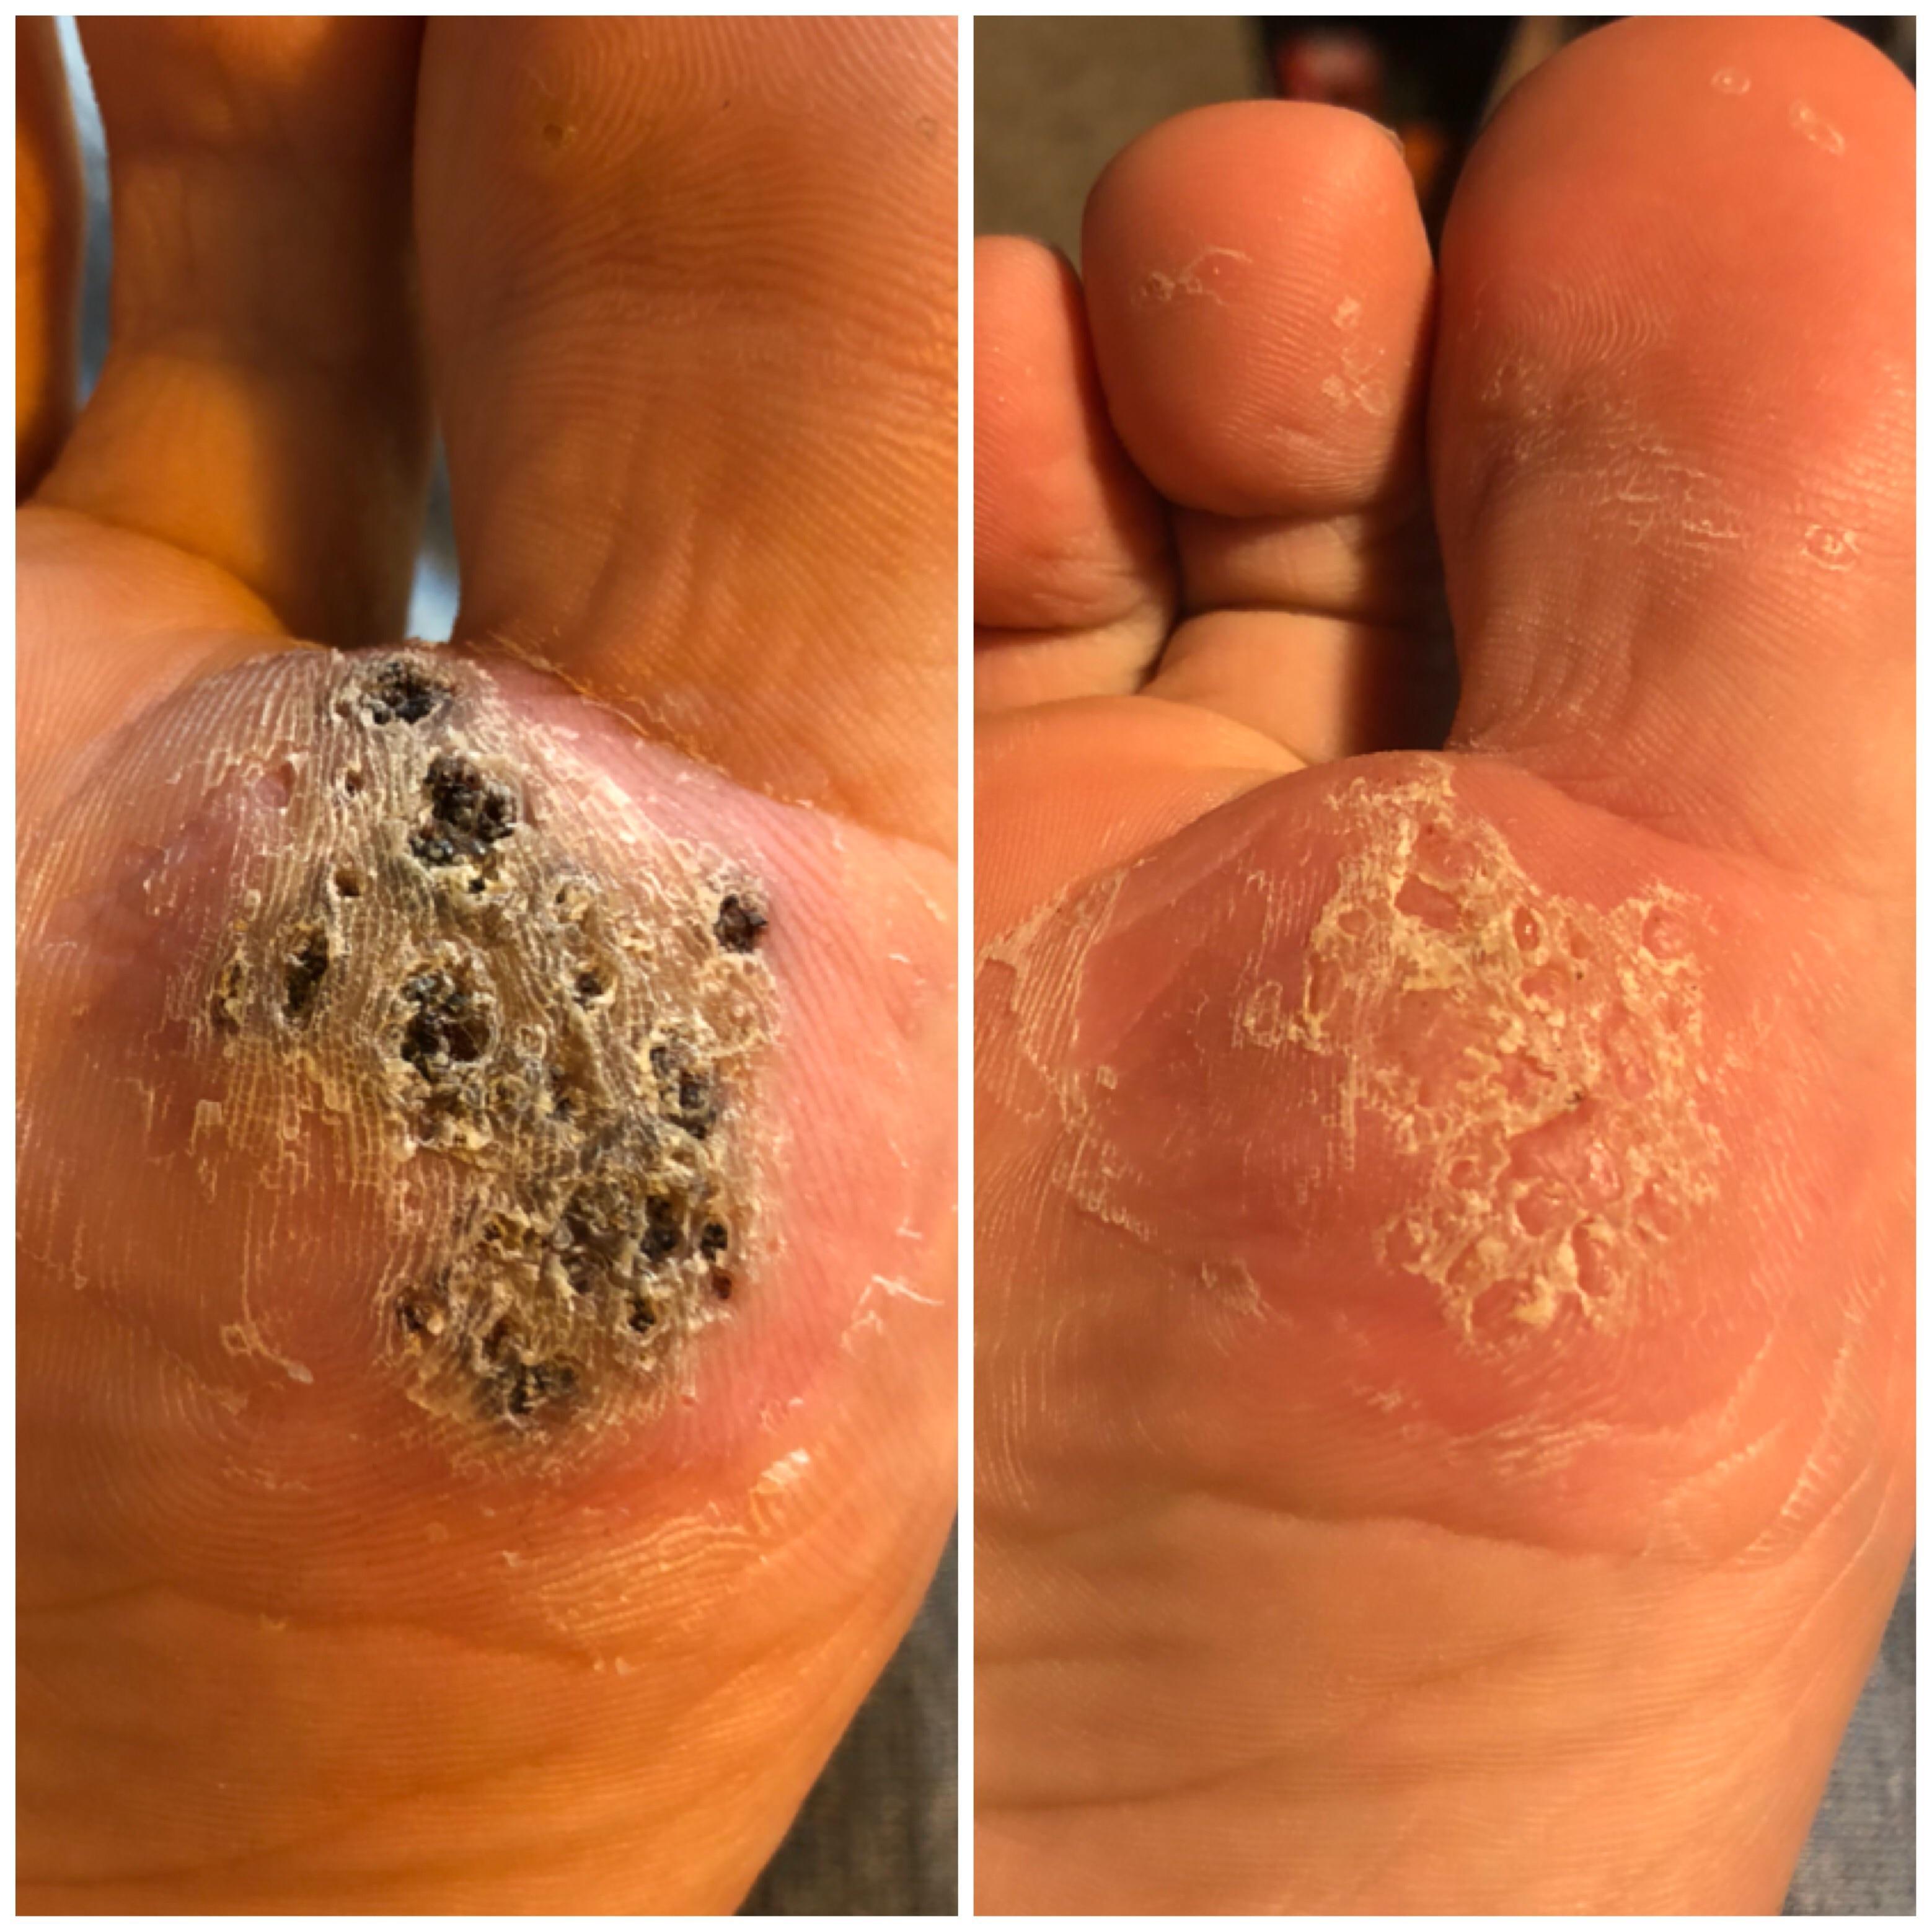 Warts treatment liquid nitrogen Metastatic cancer meaning in kannada